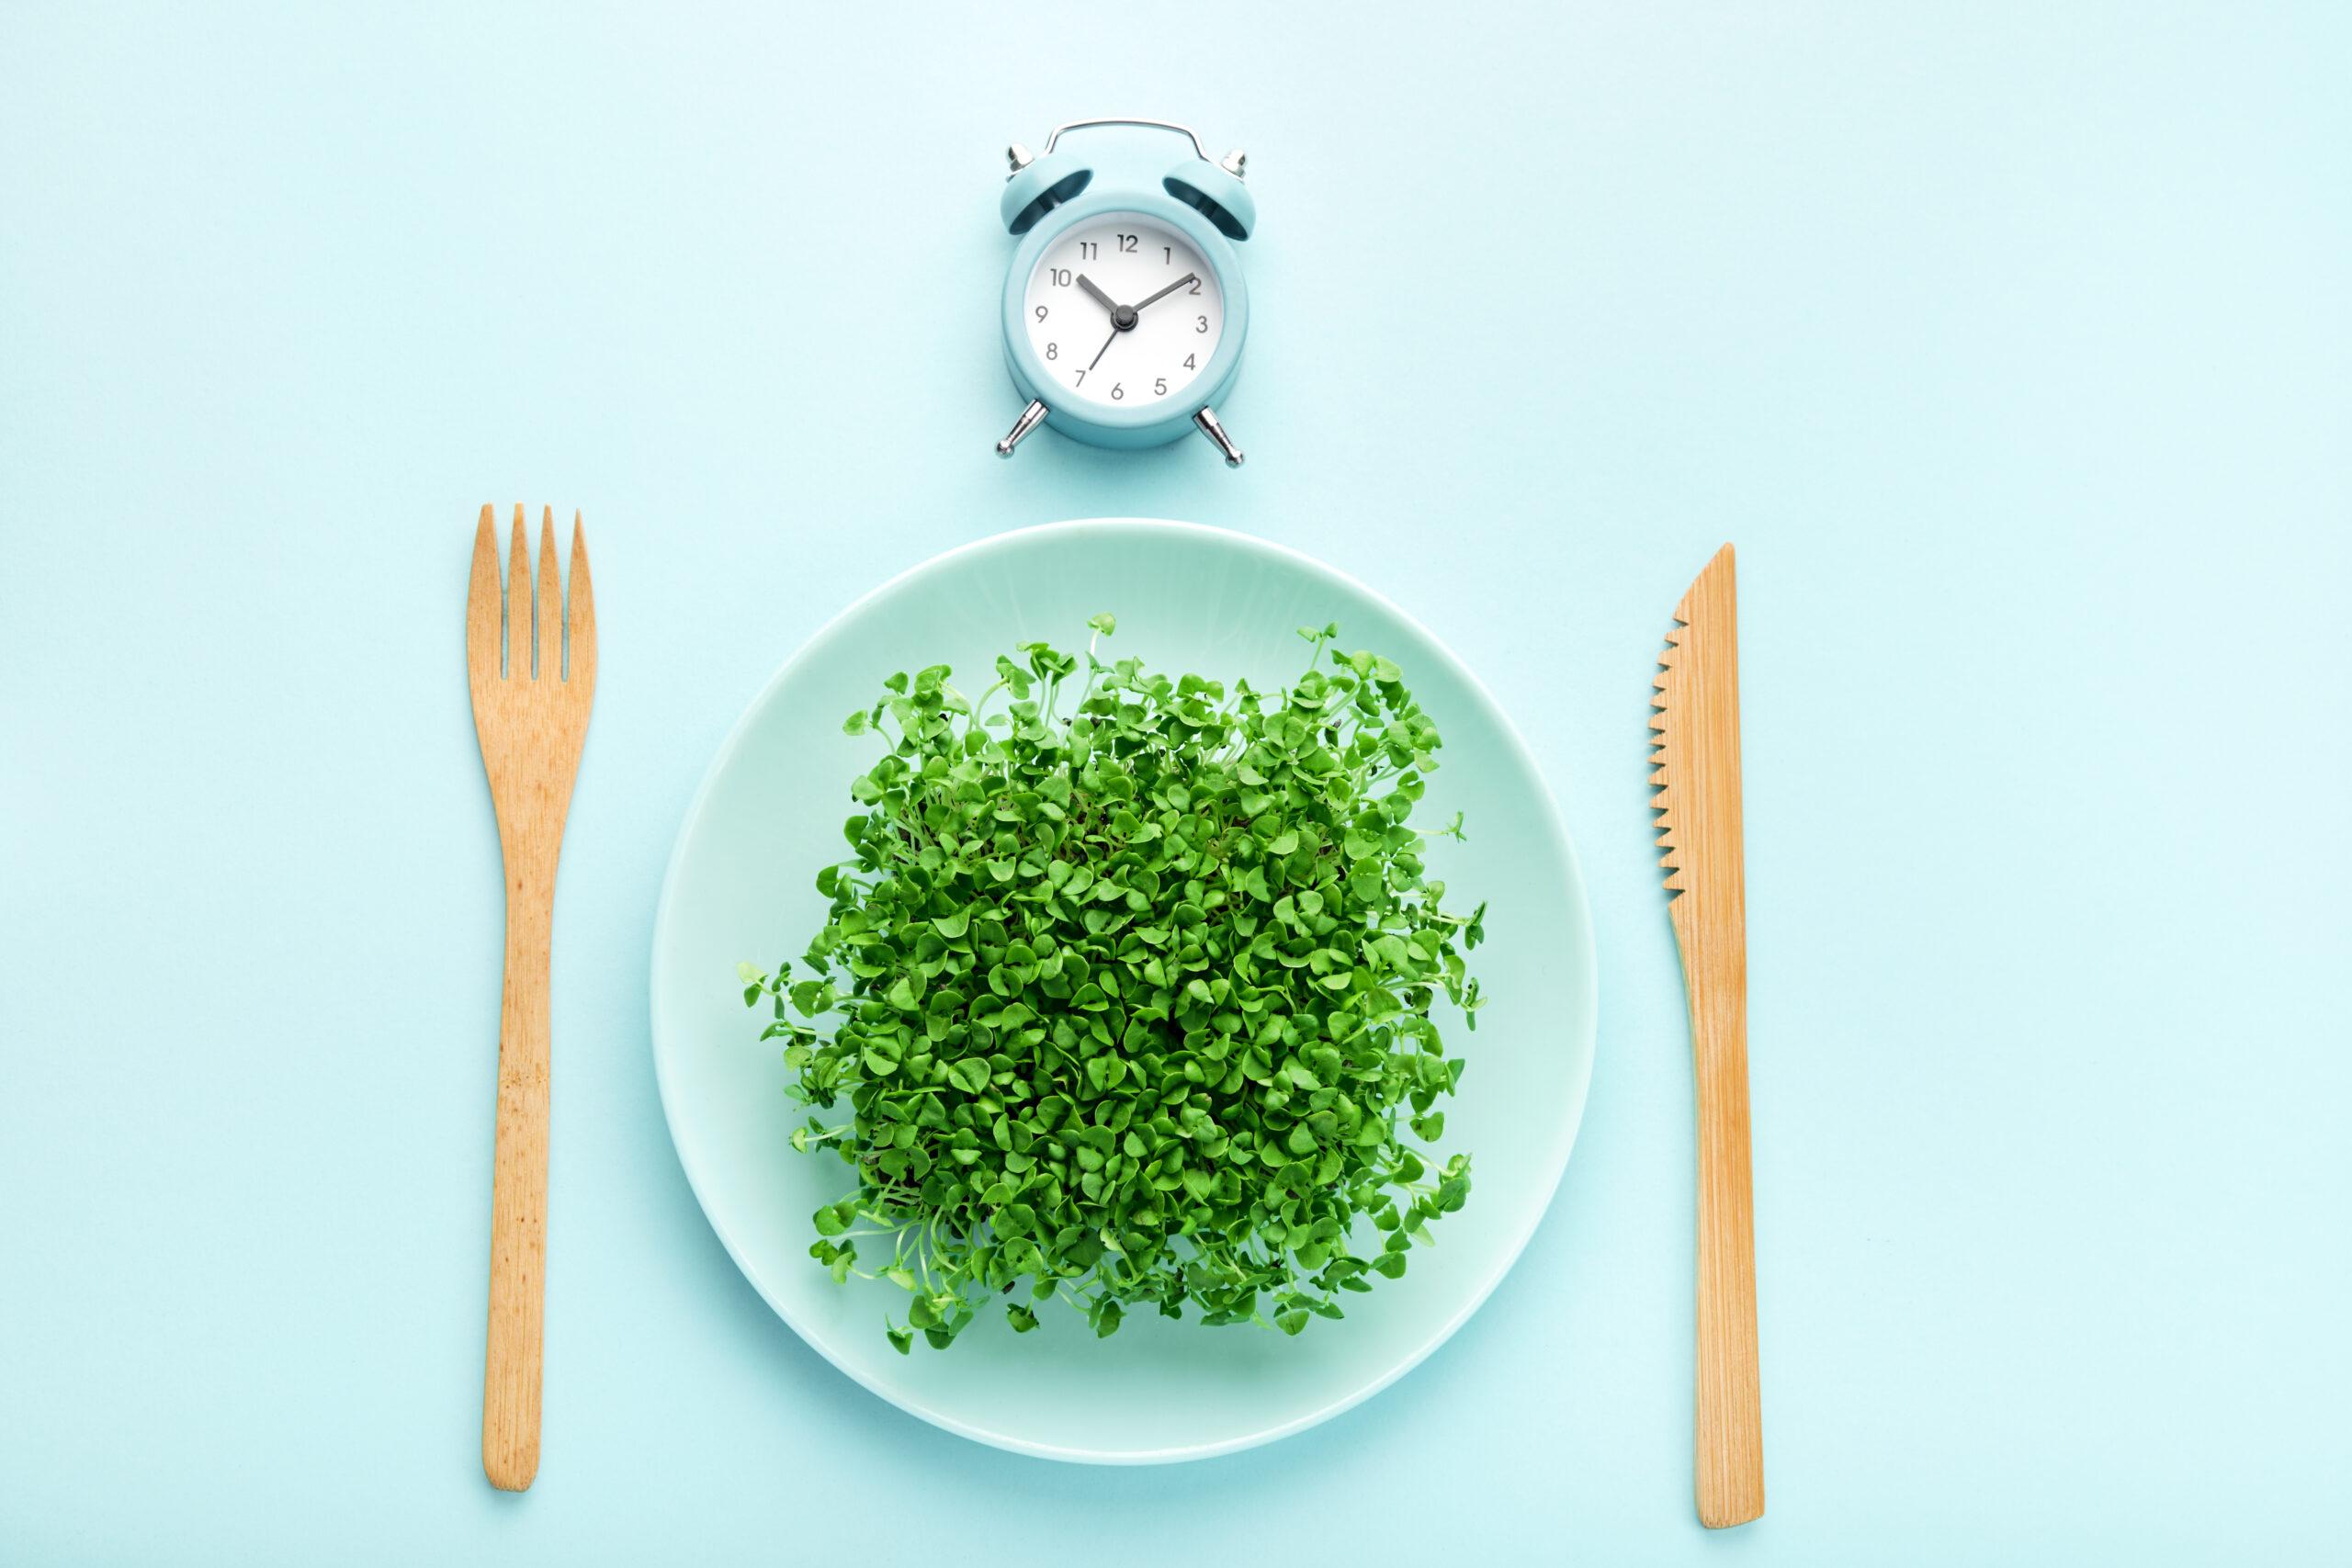 Image of plate for fasting break